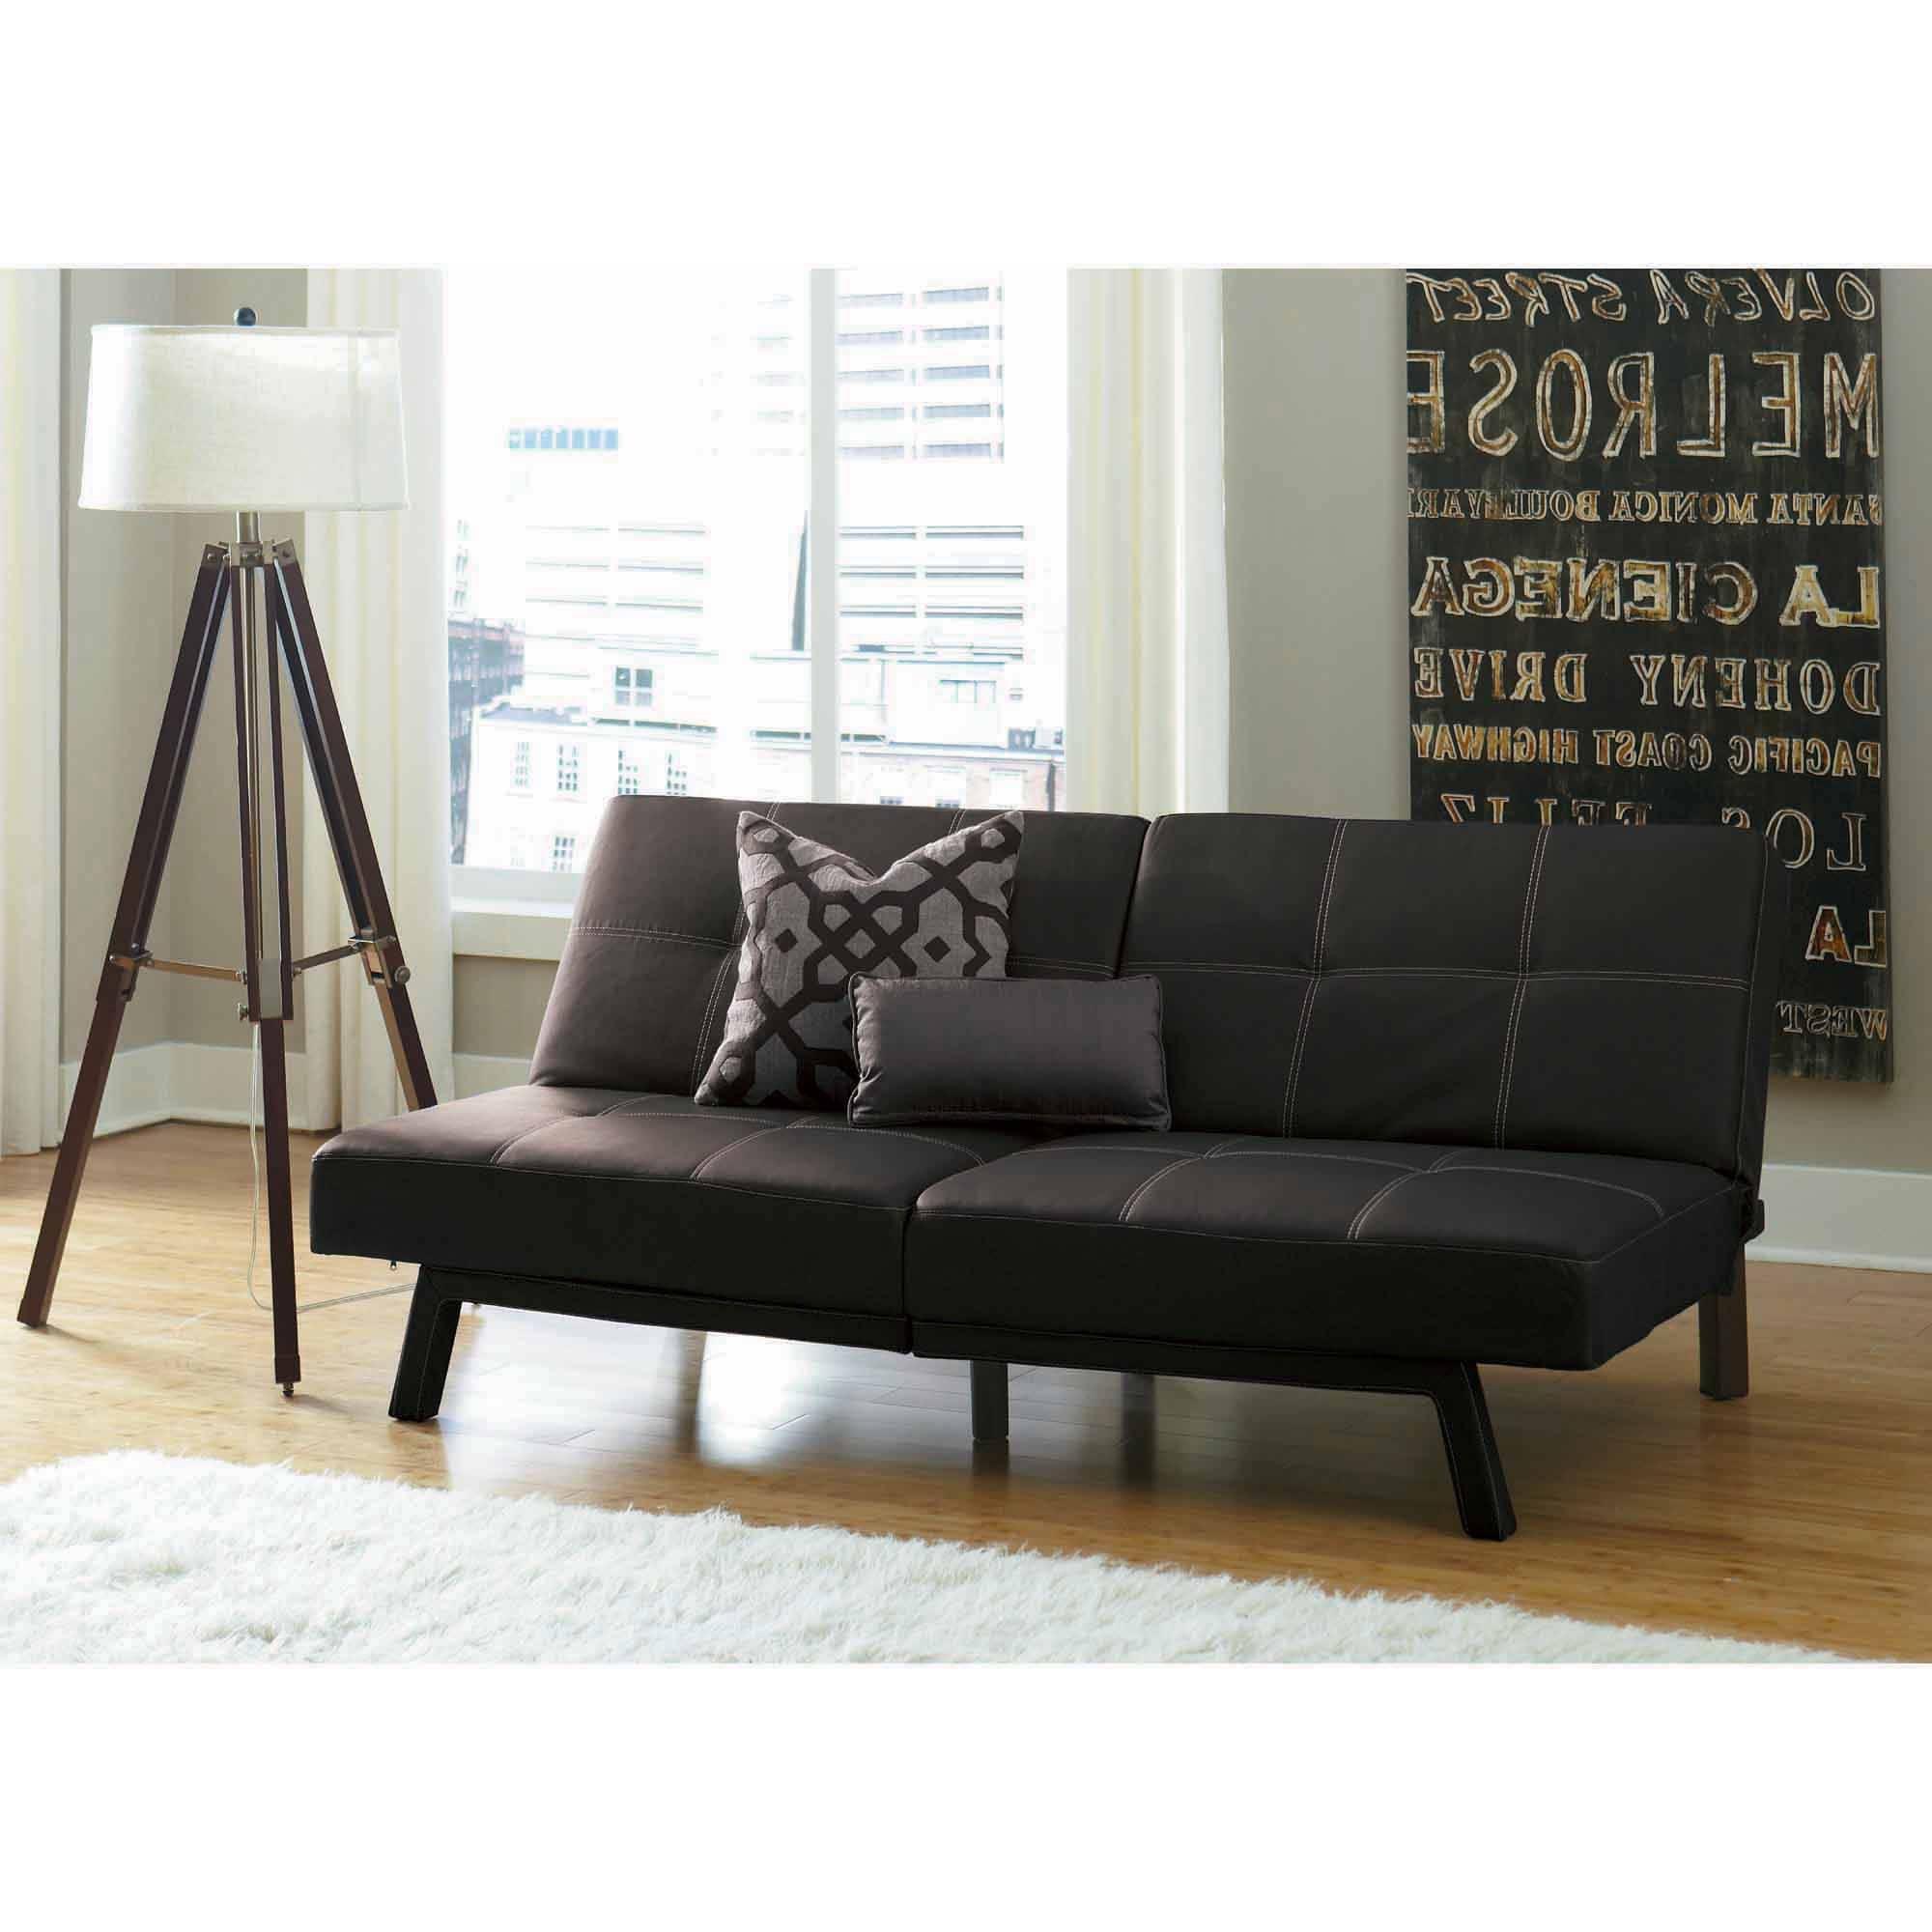 Sofas Sectionals Stylish Big Lots Sofa Sleeper Big Lots Futon Throughout Big Lots Sofa Bed (View 8 of 15)